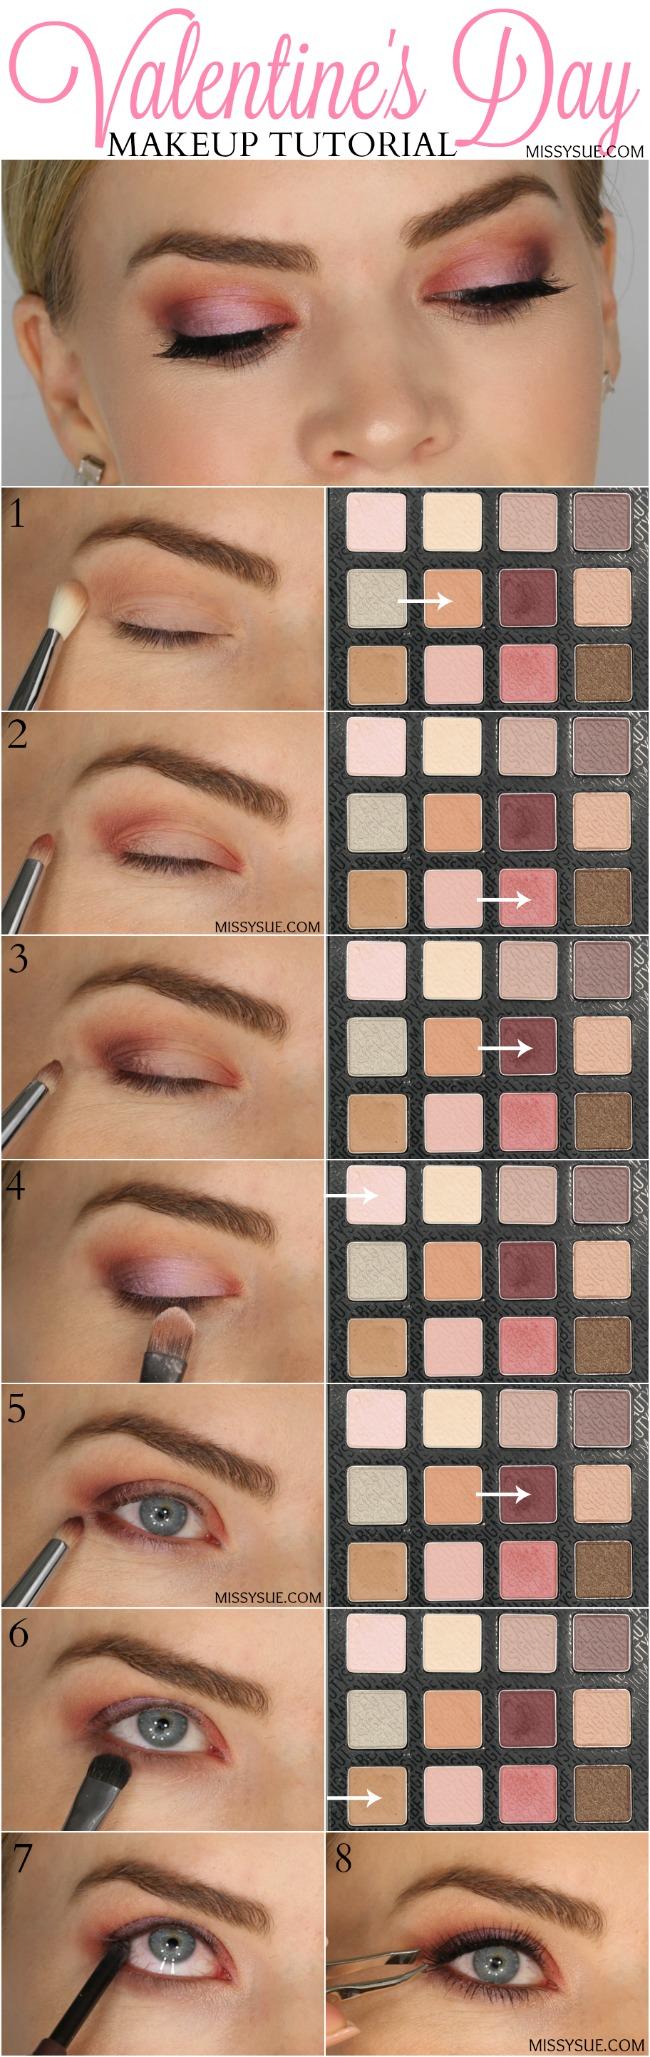 valentines-day-pink-makeup-tutorial-missysue-2